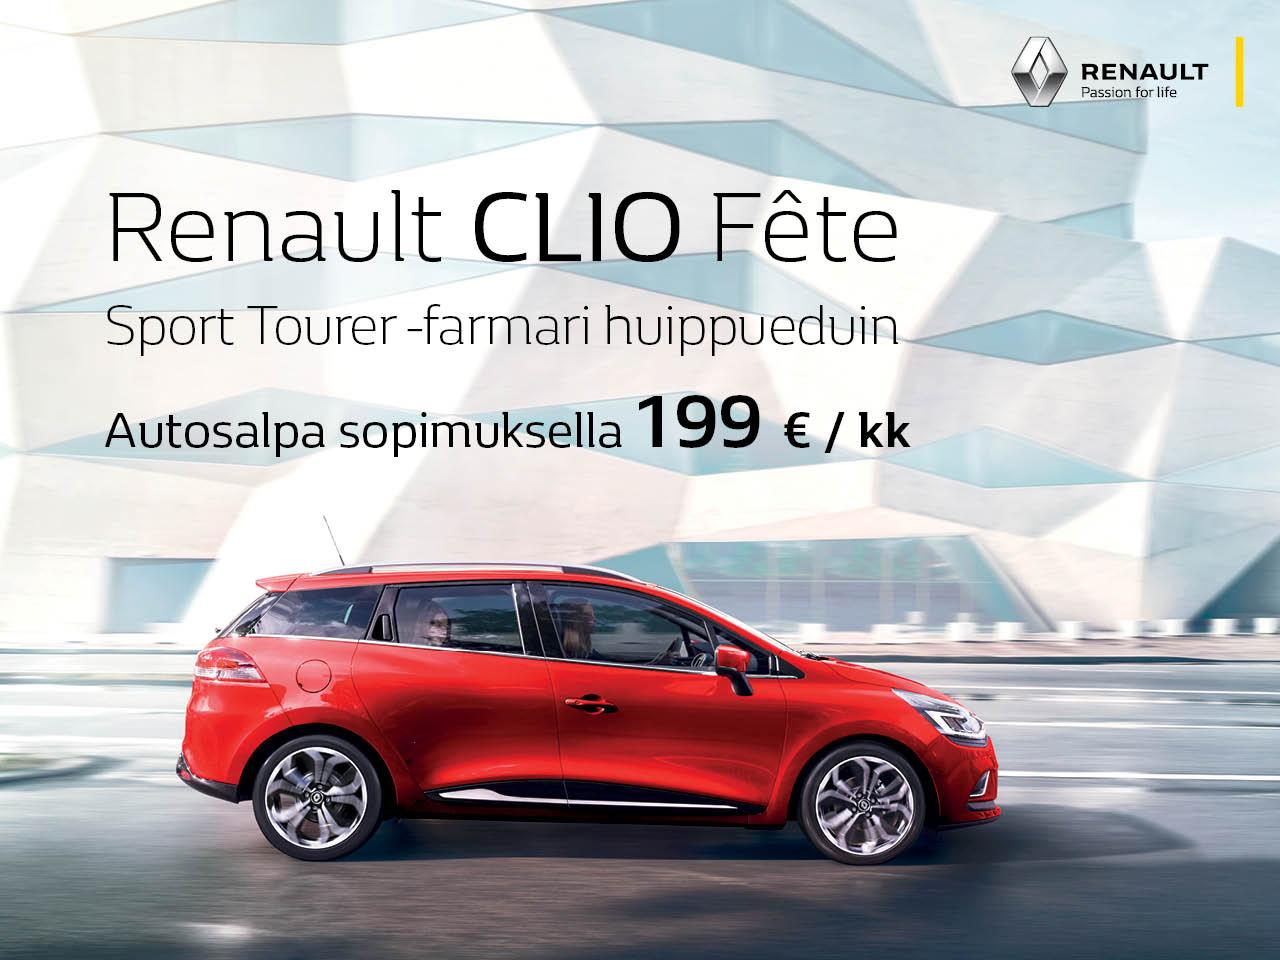 Renault Clio Fête ST huippueduin